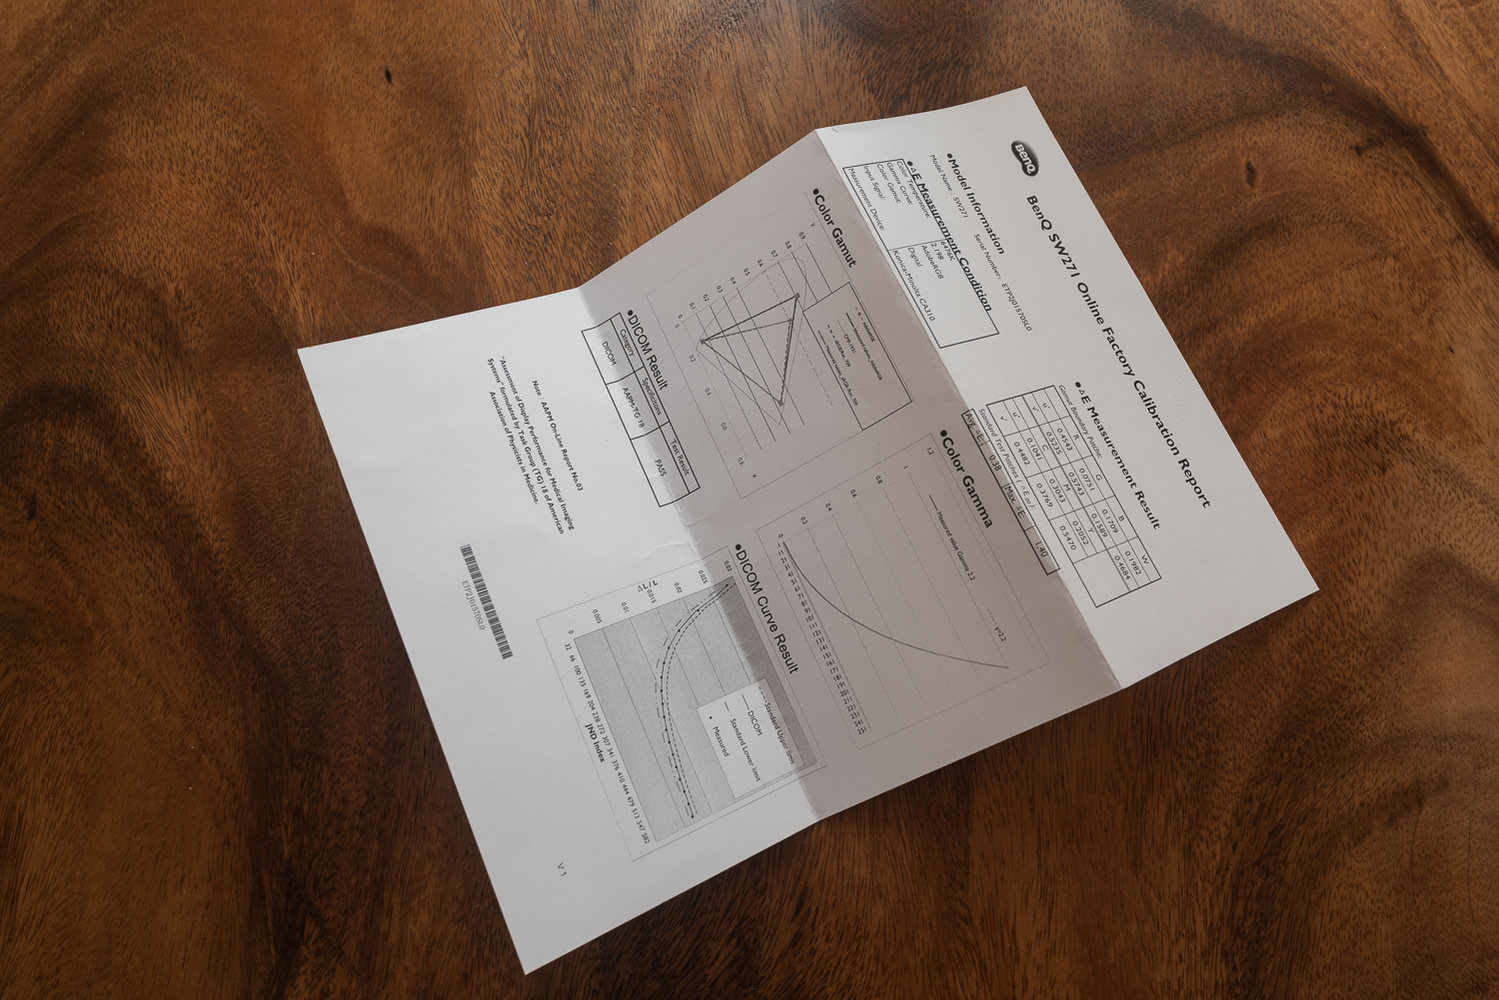 BenQ SW271 monitor calibration report